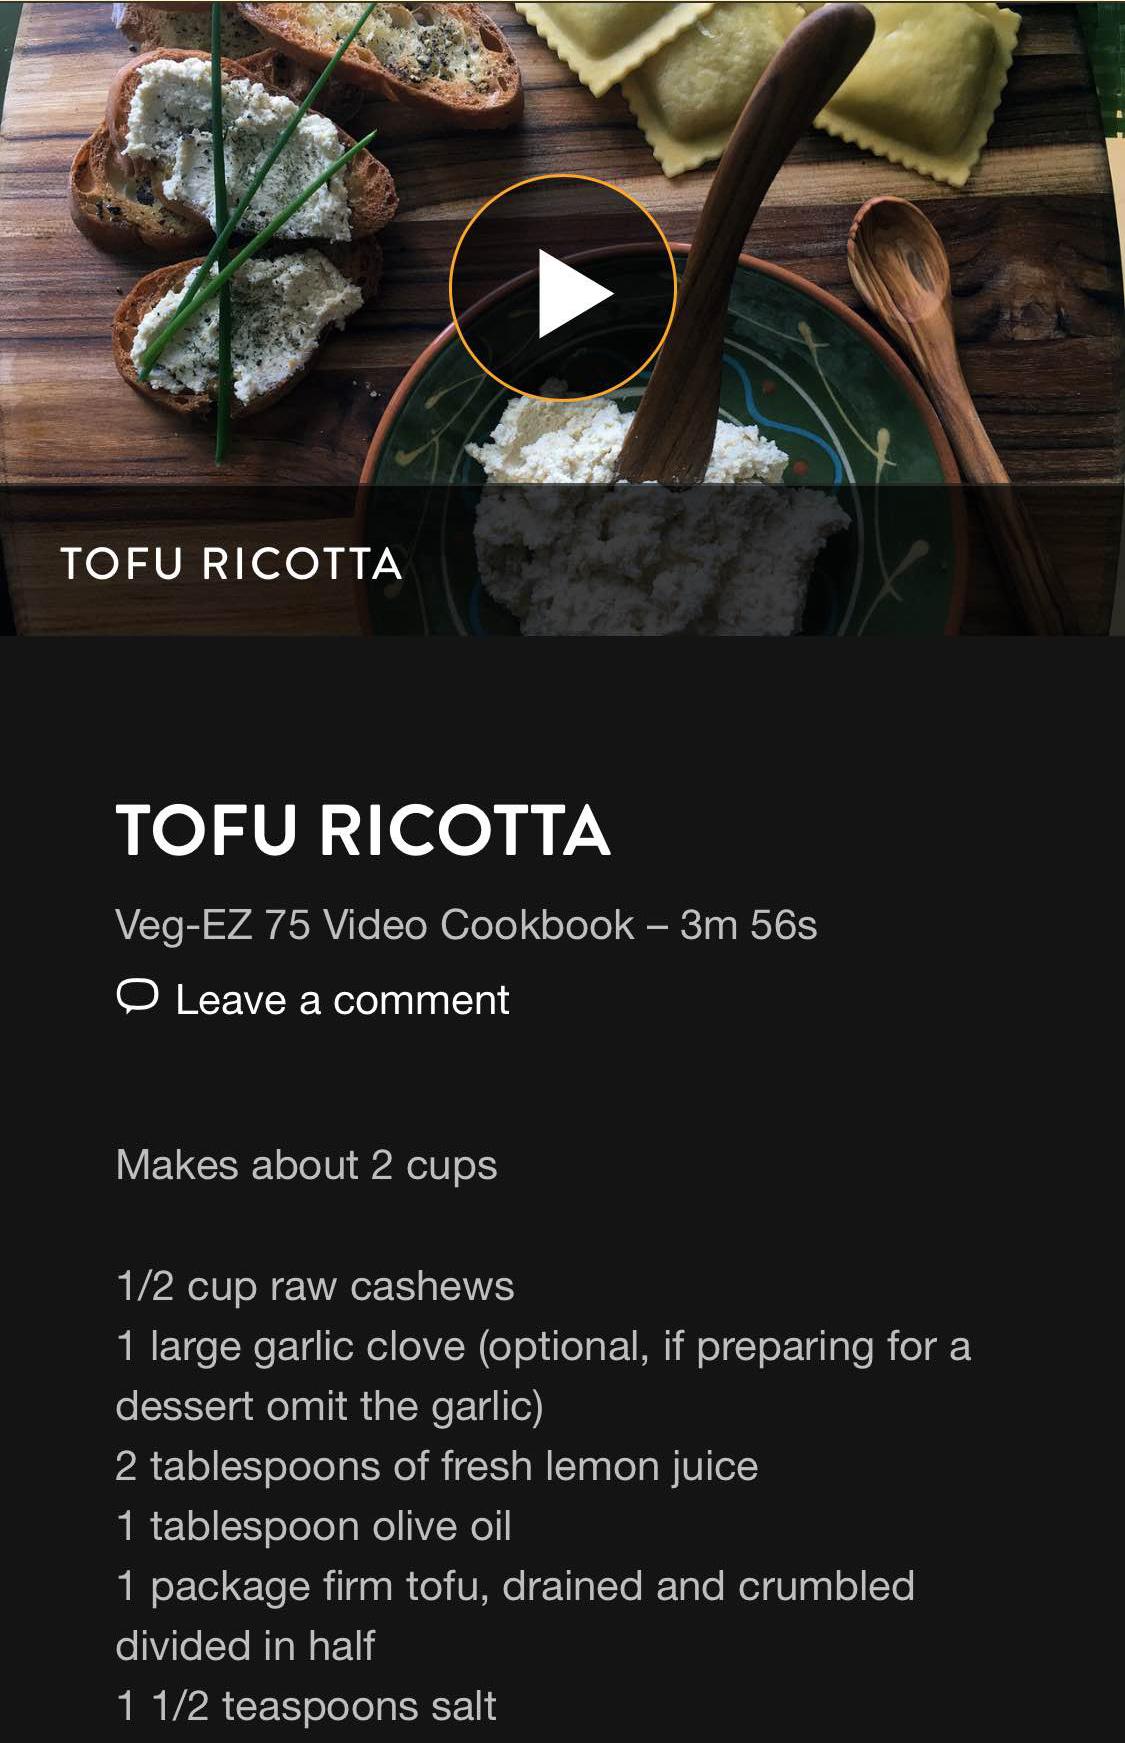 VegEZ Tofu Ticotta screenshoot.jpg